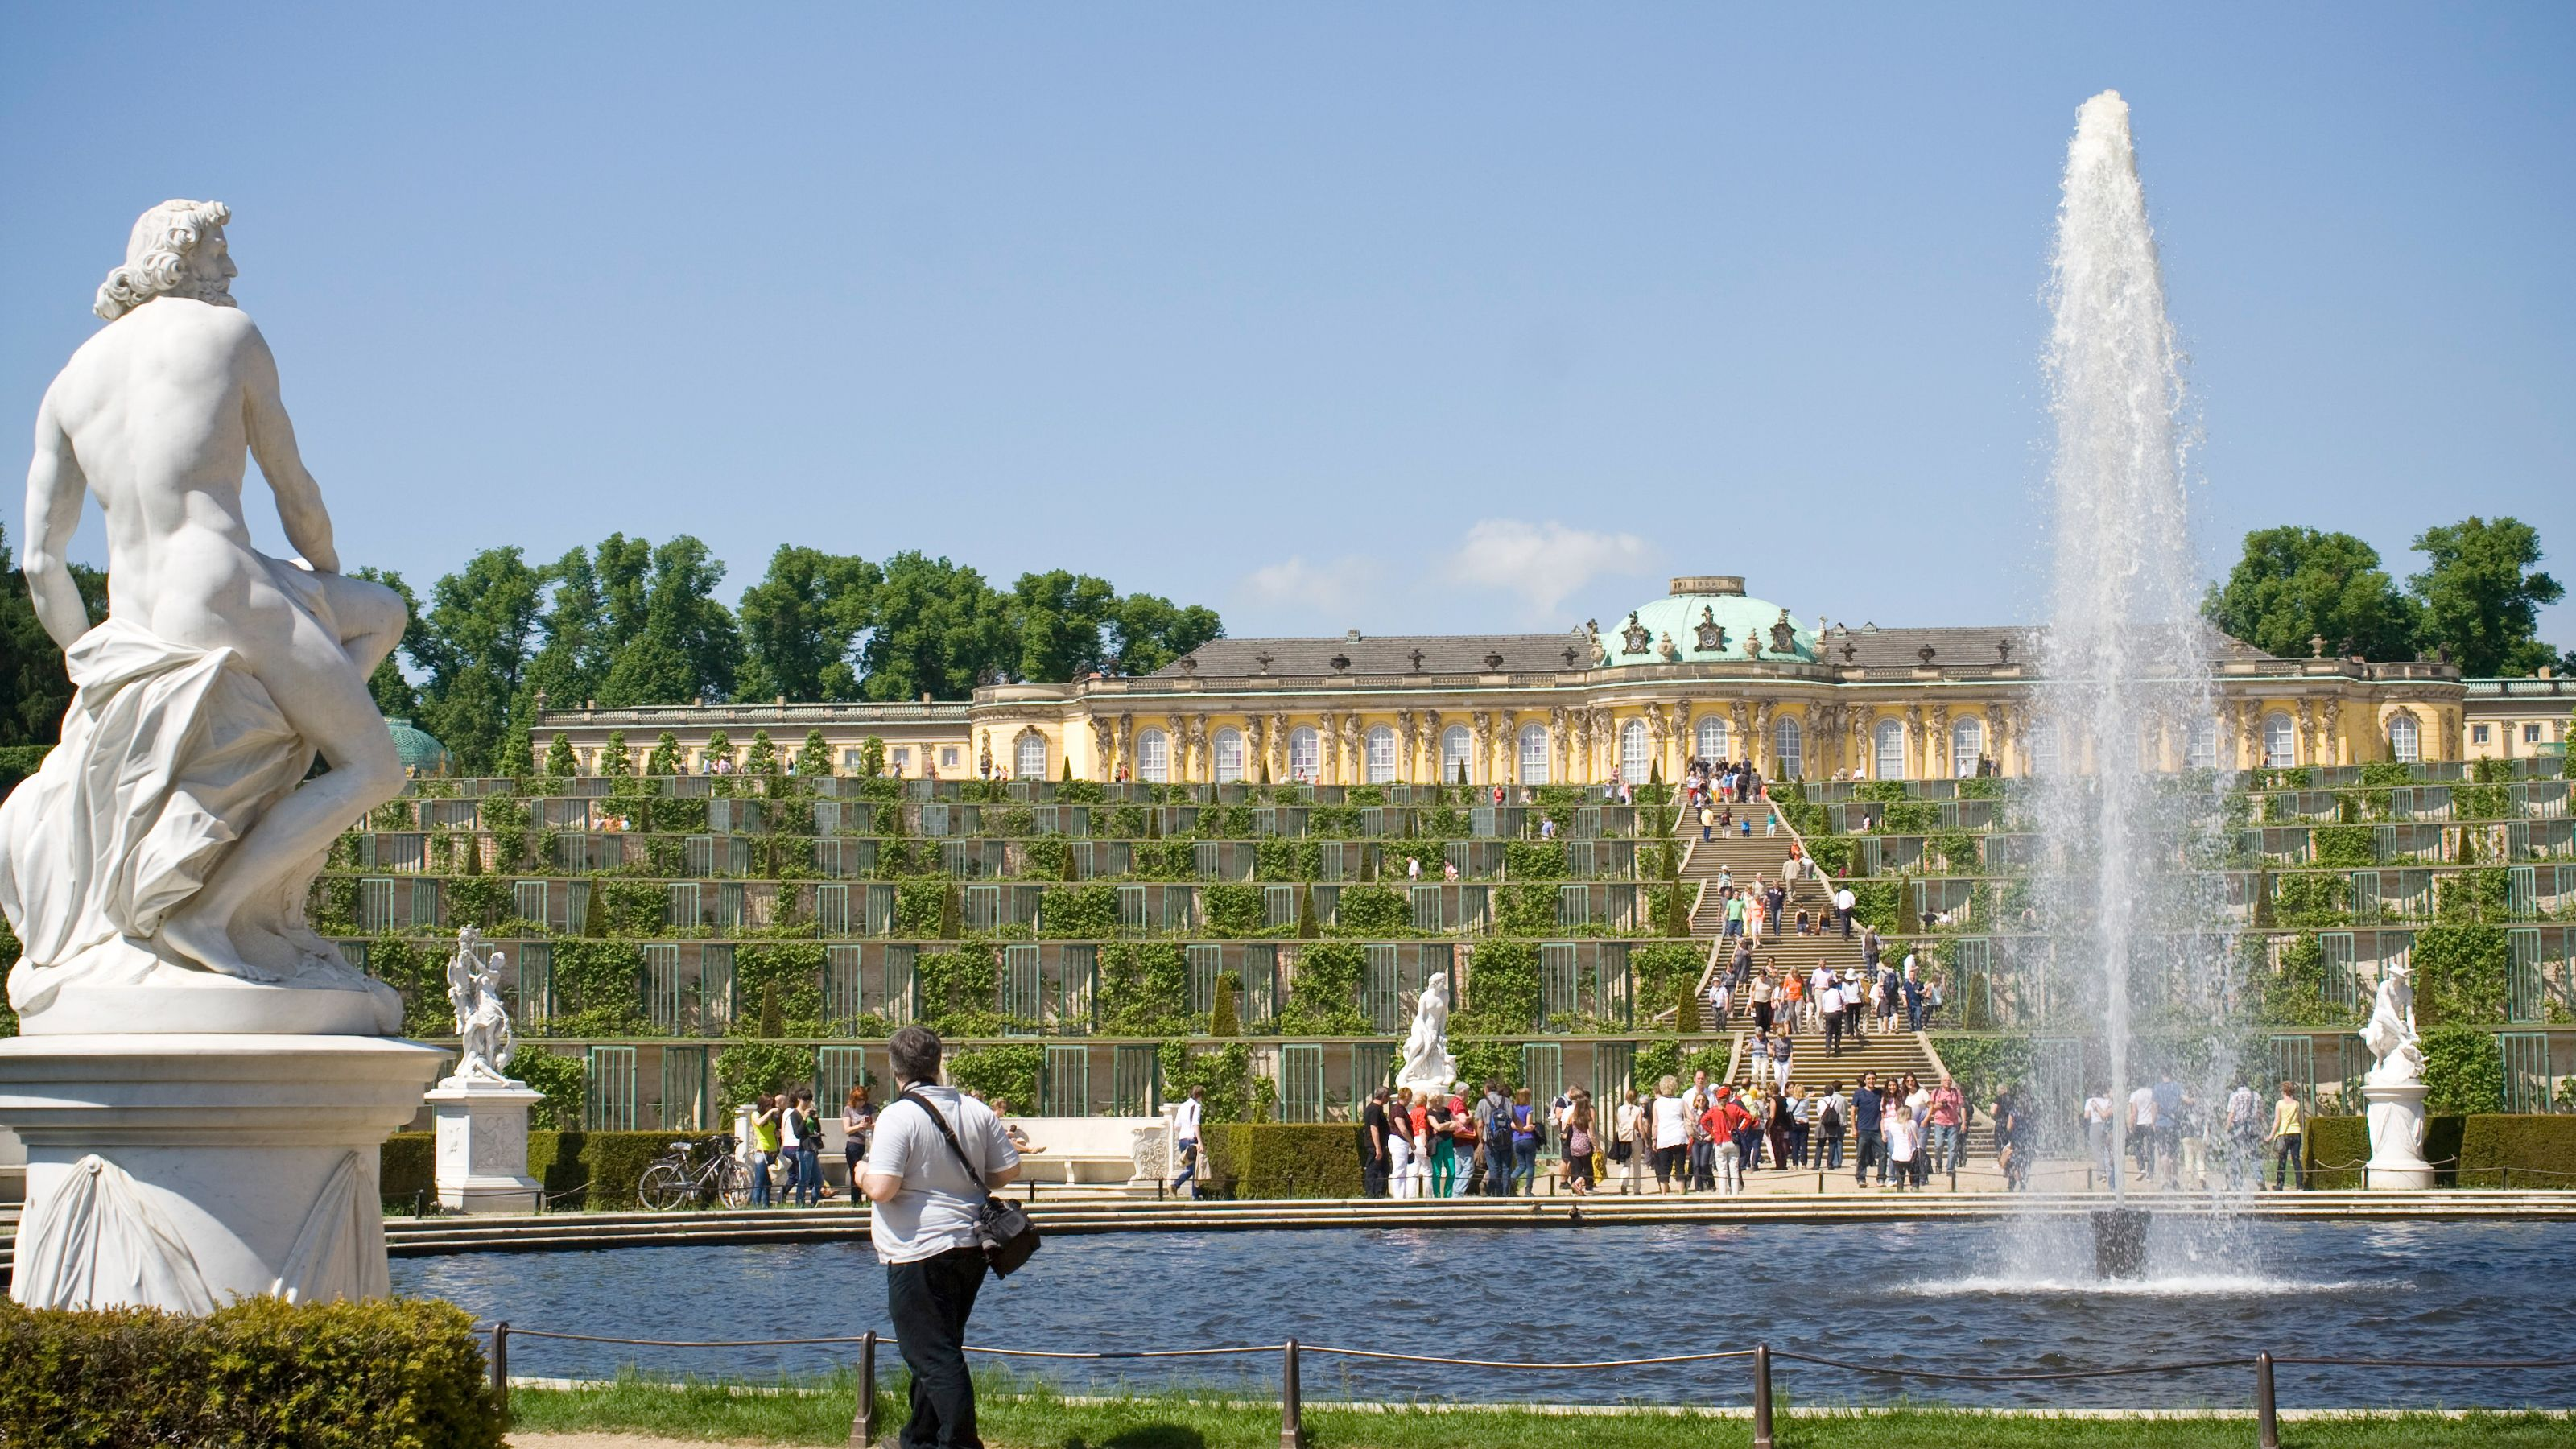 Guidad heldagstur i Potsdam